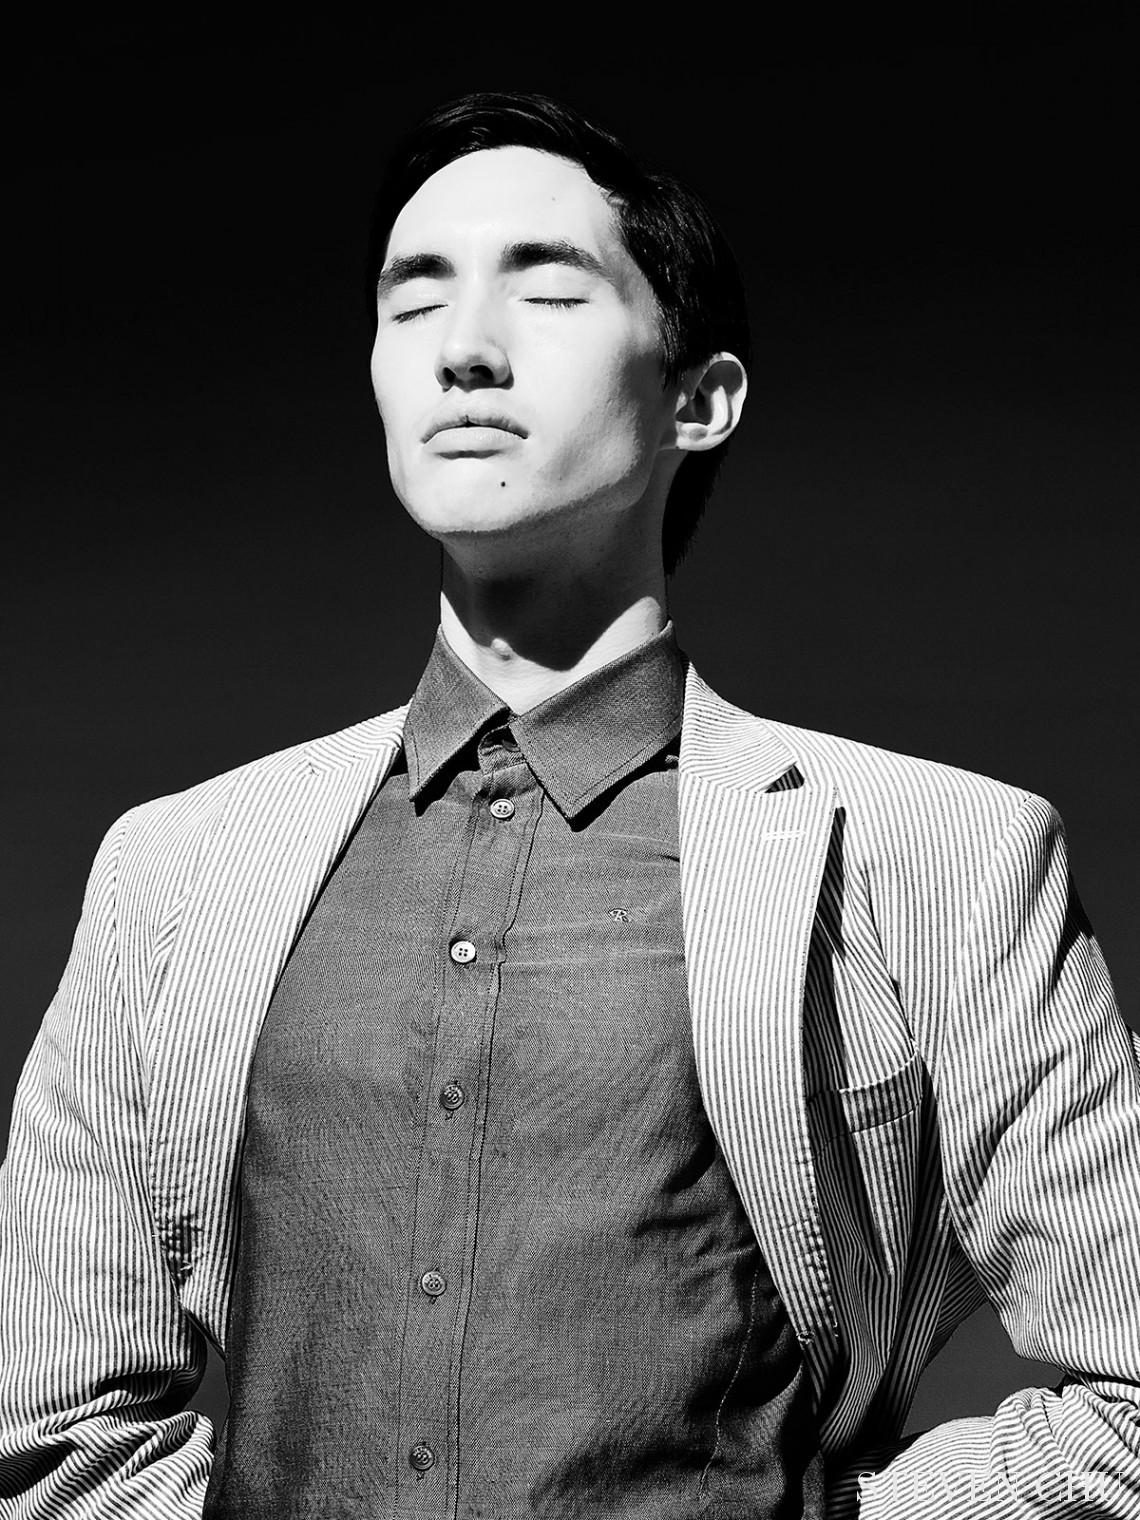 Kyle Rodriguez - Photographer Steven Chu